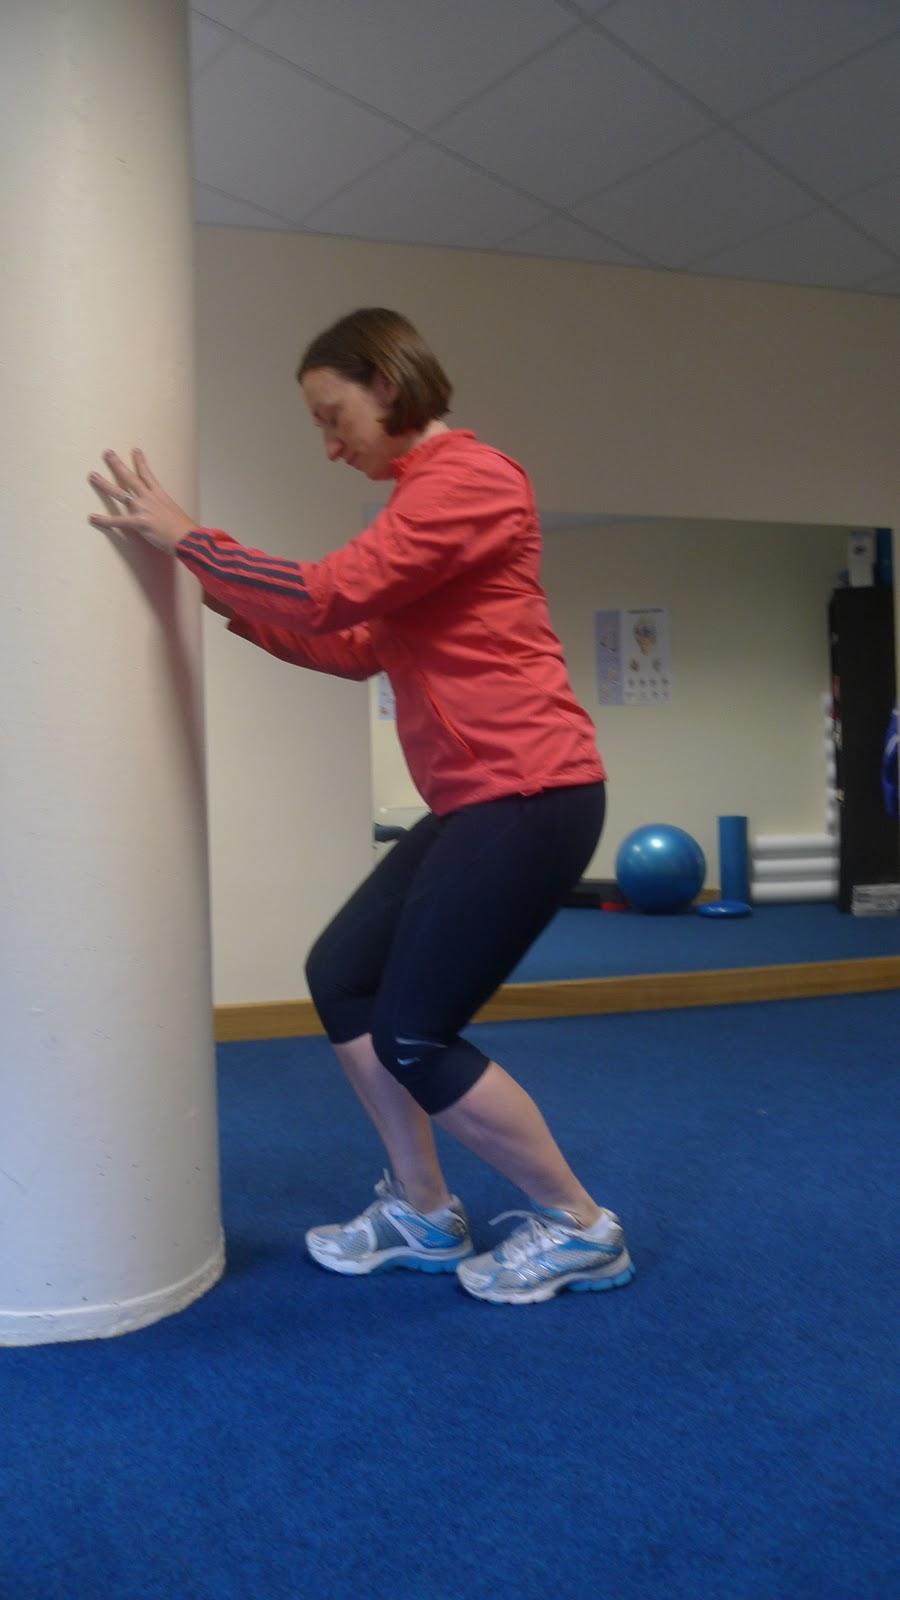 East Coast Physio: Stretches